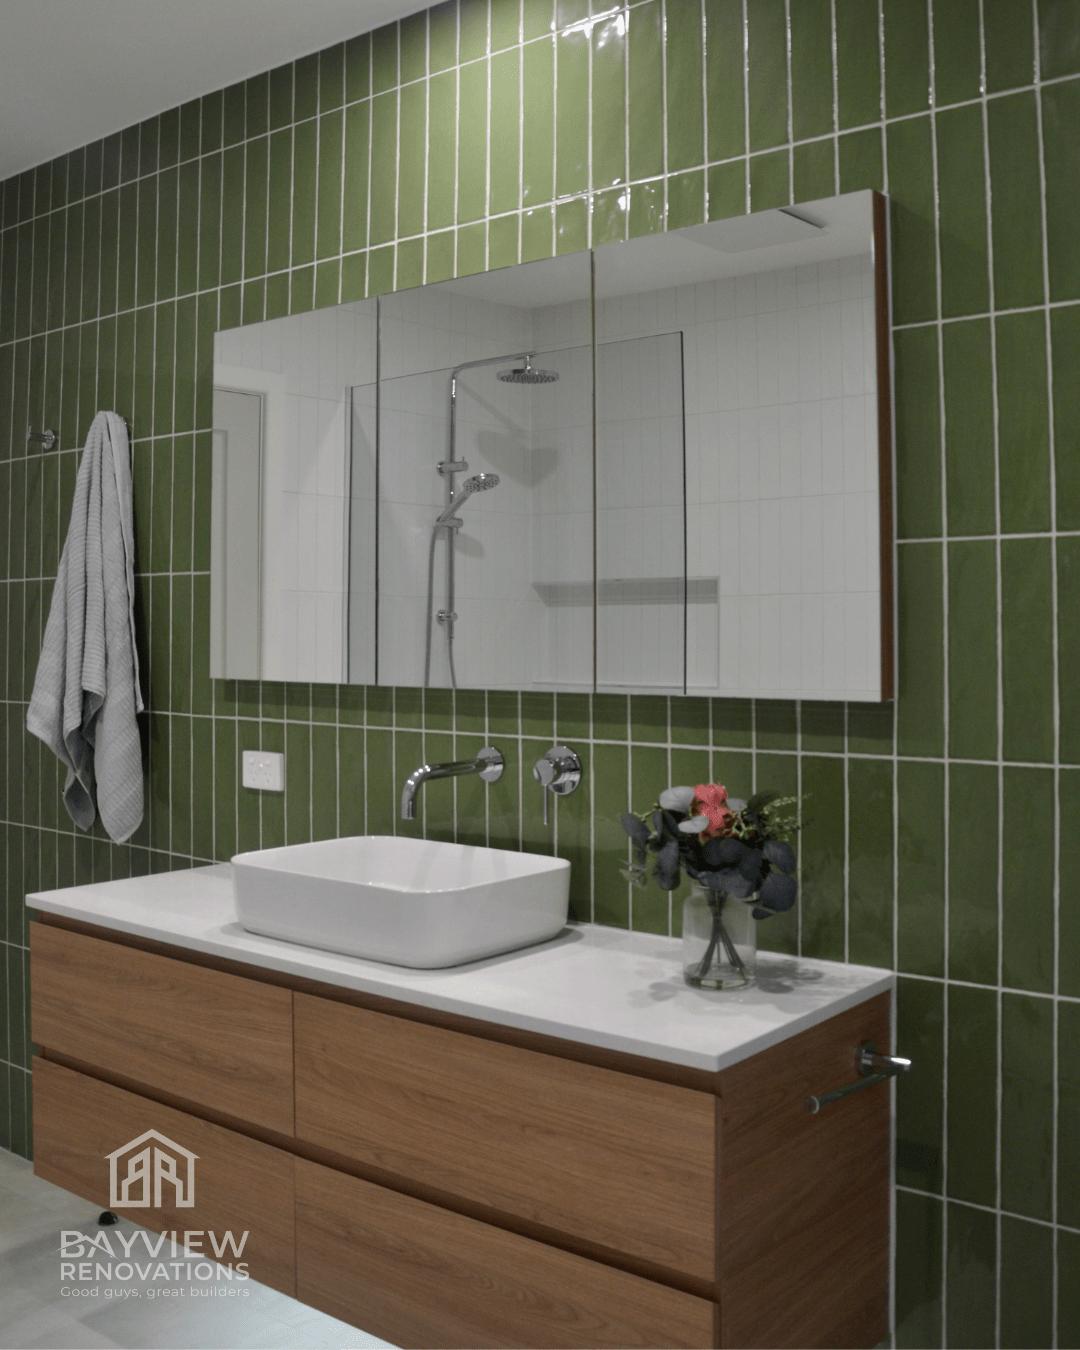 Hilton Street Main Bathrom Renovation - Bayview Renovations